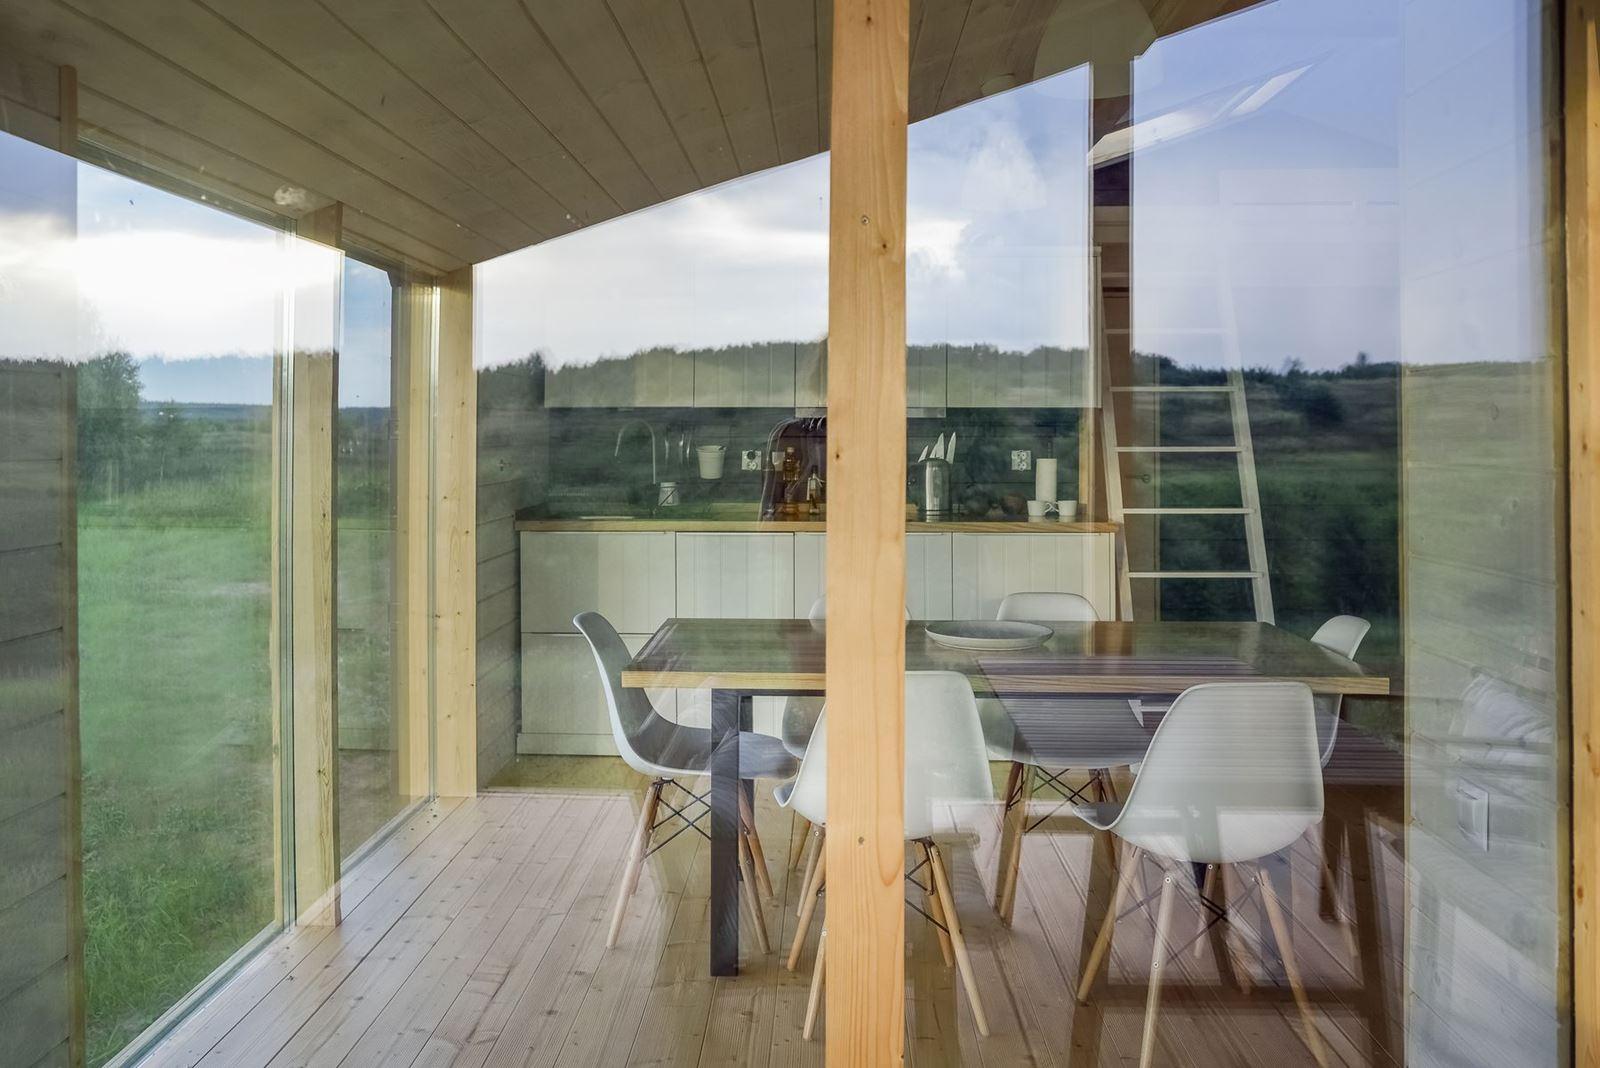 Una casa ecologica e prefabbricata - Mansarda.it